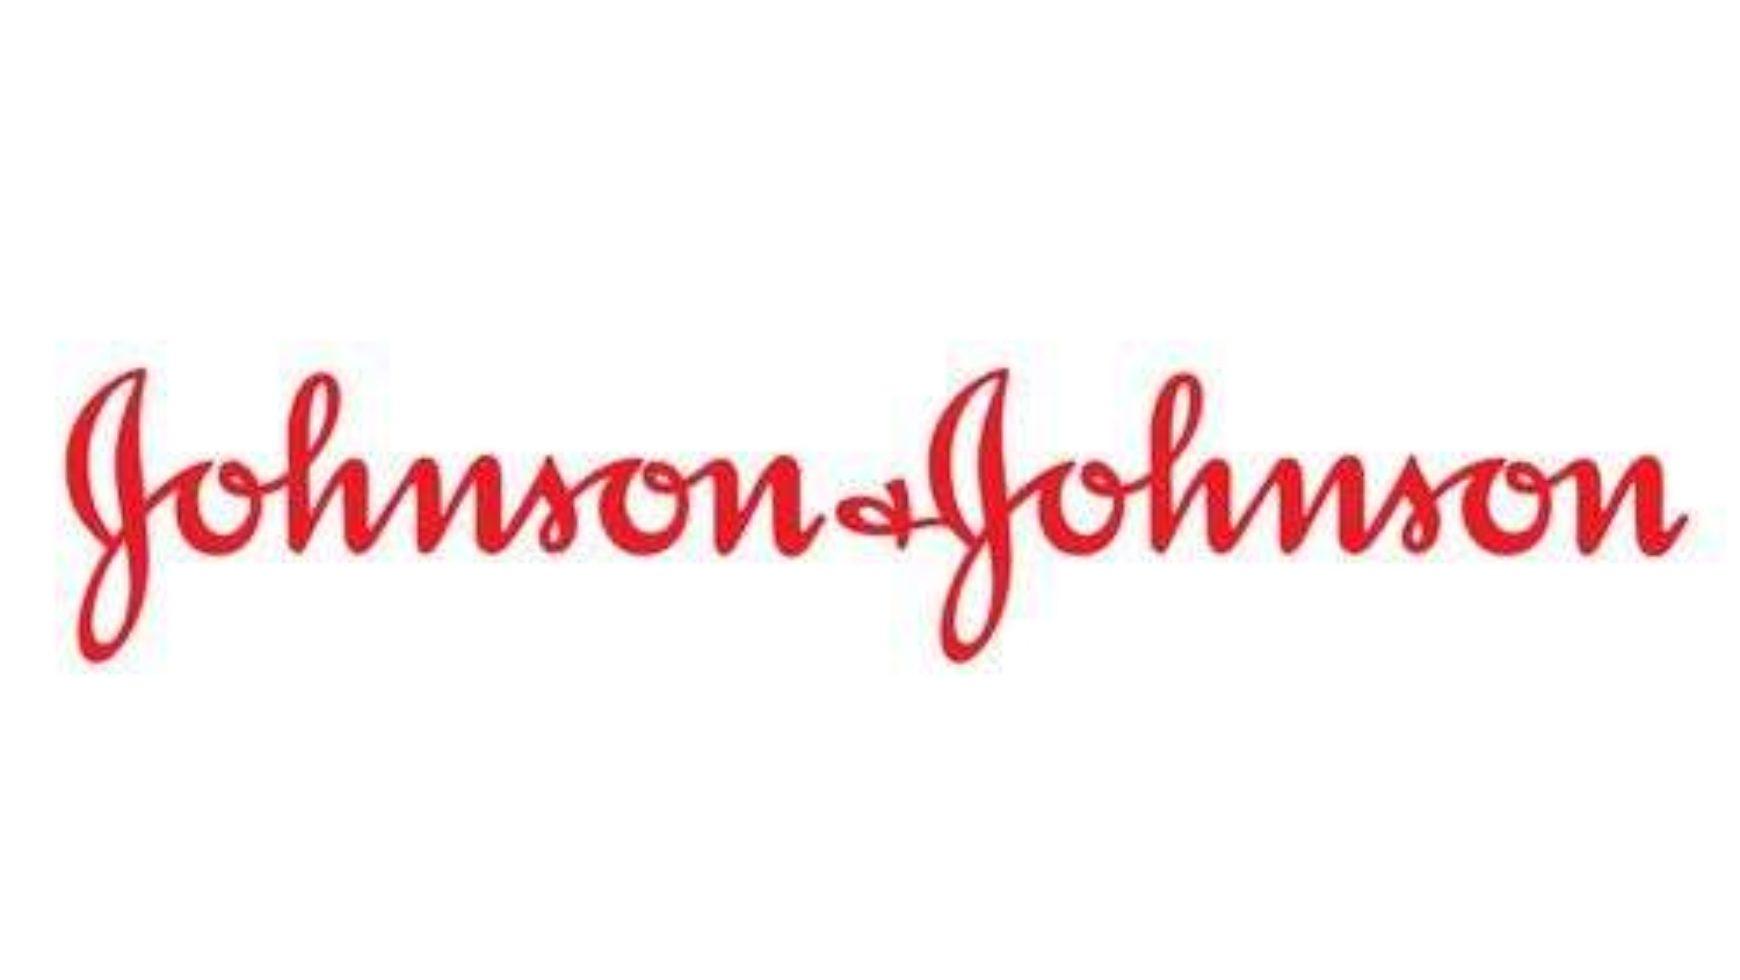 Jhonson and Johnson